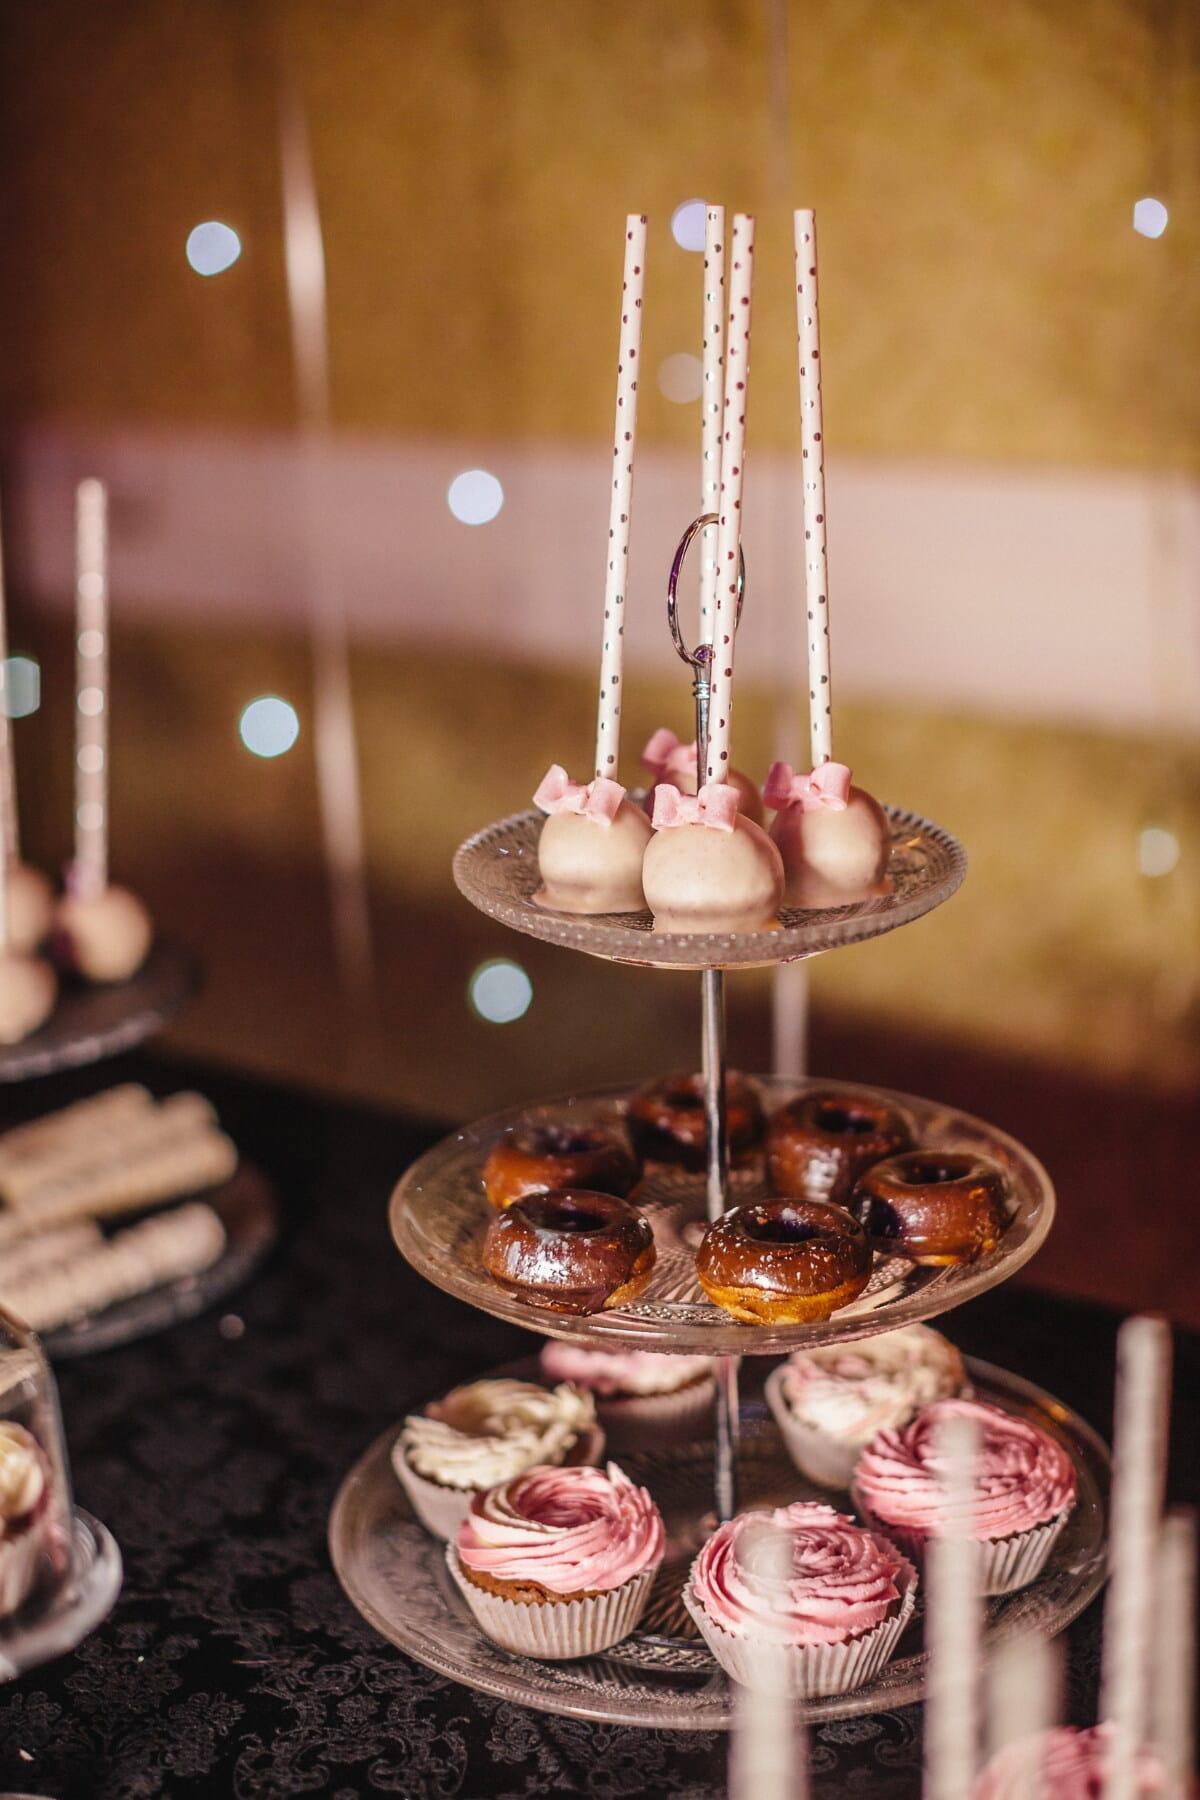 lollipop, cupcake, cake shop, party, glass, dinner, sugar, food, chocolate, indoors